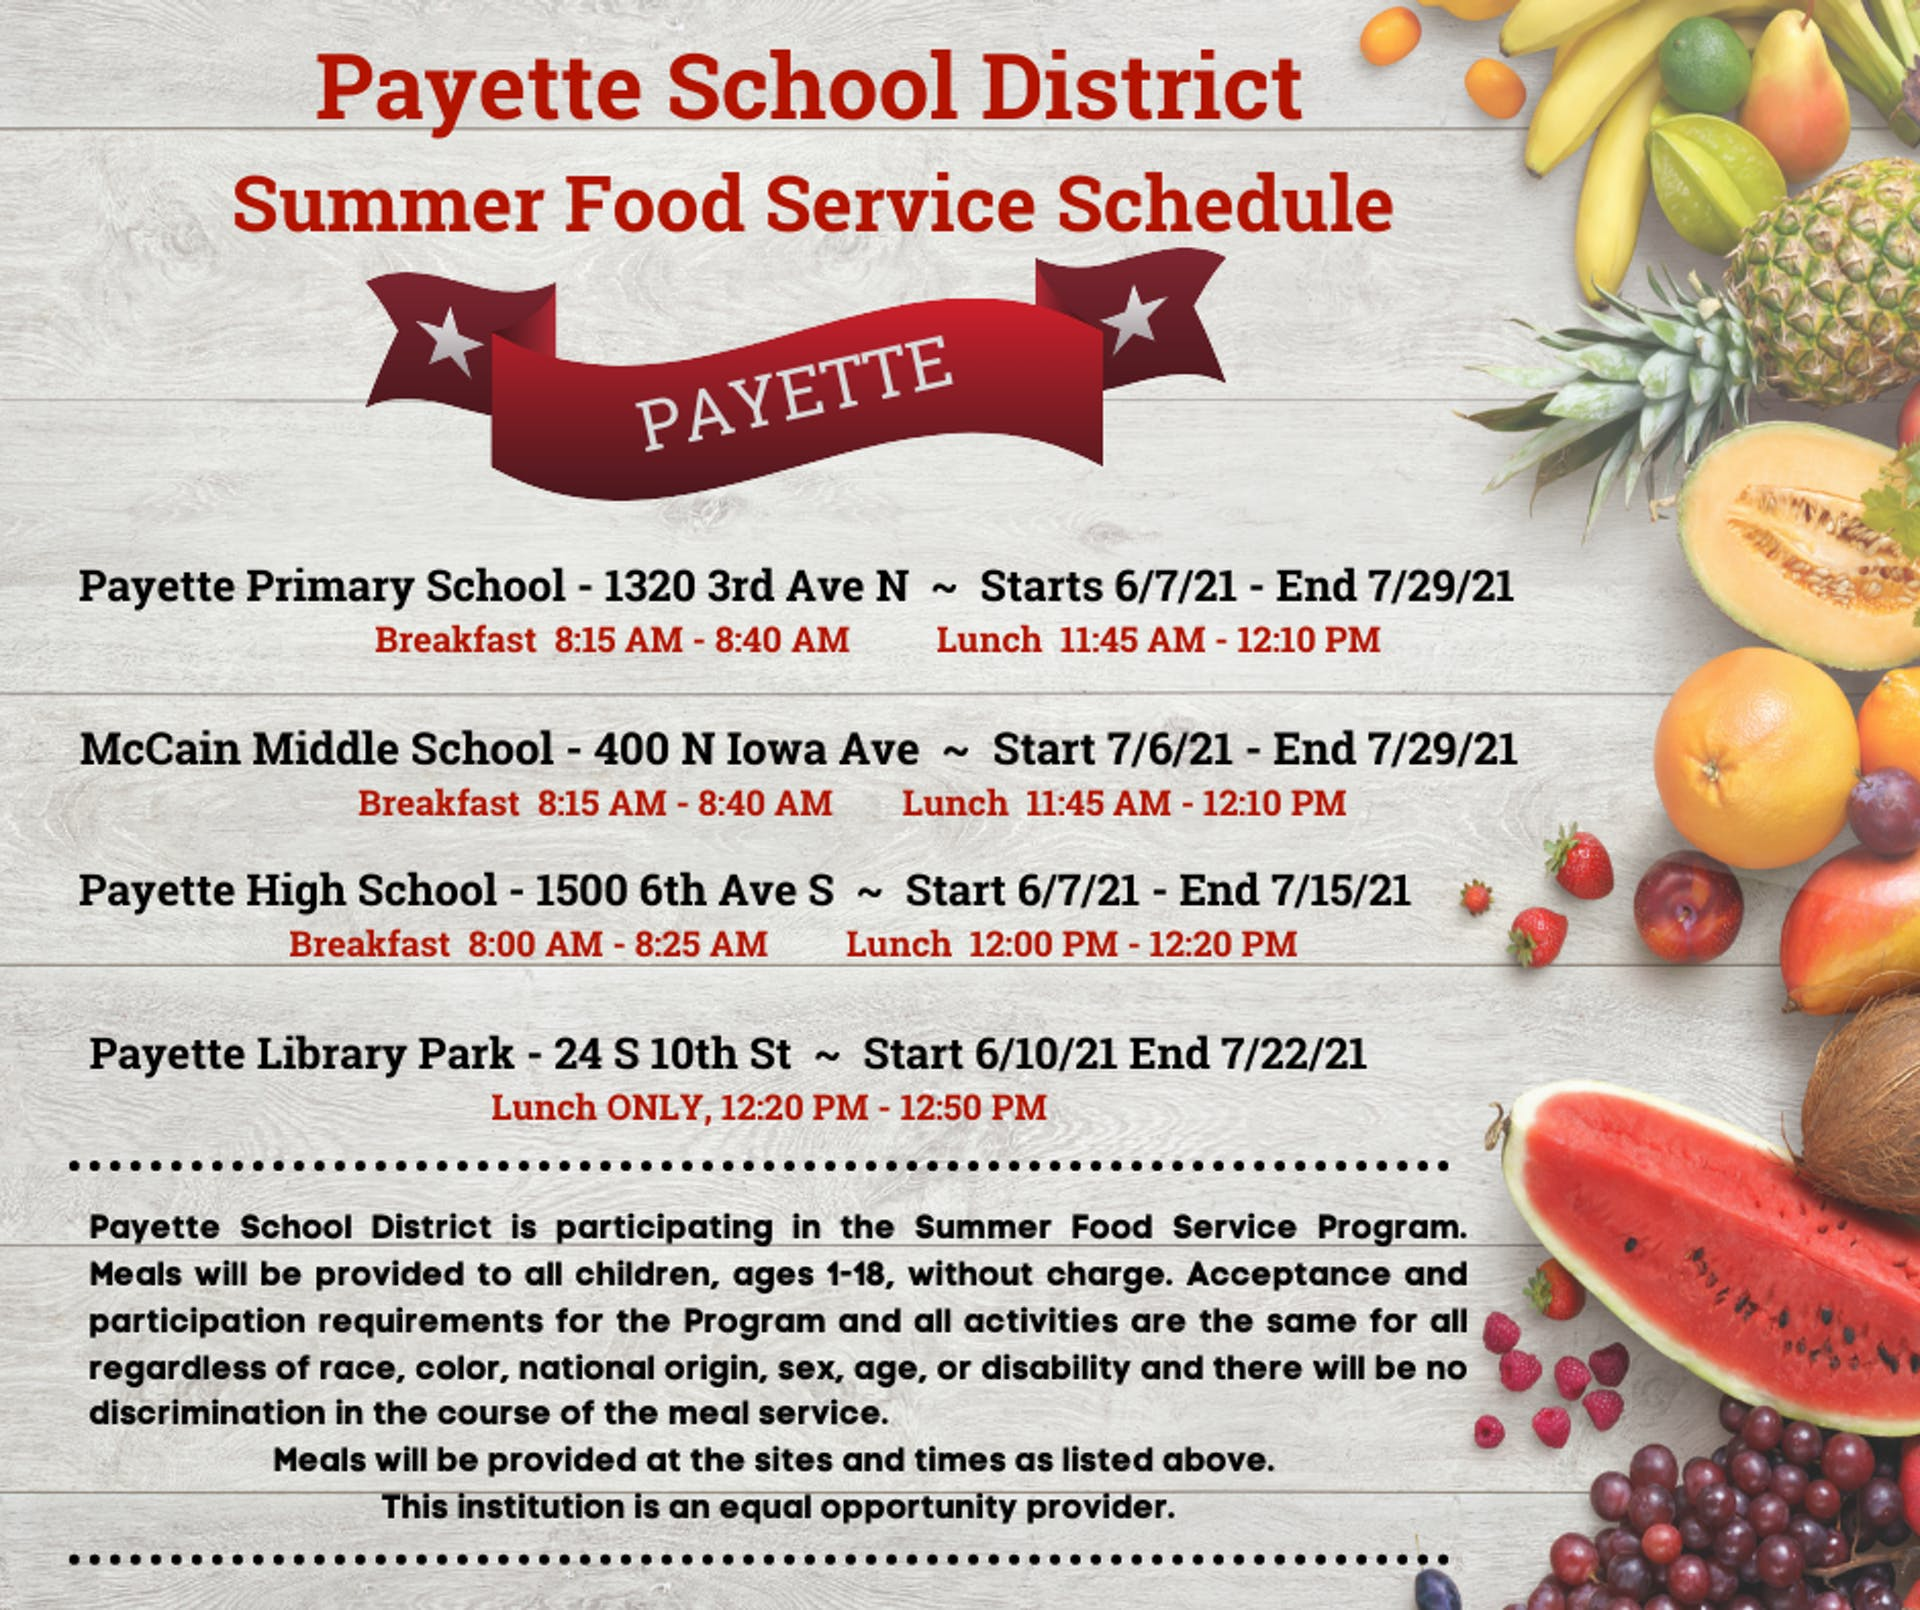 Payette School District Summer Food Service Schedule Dates Image